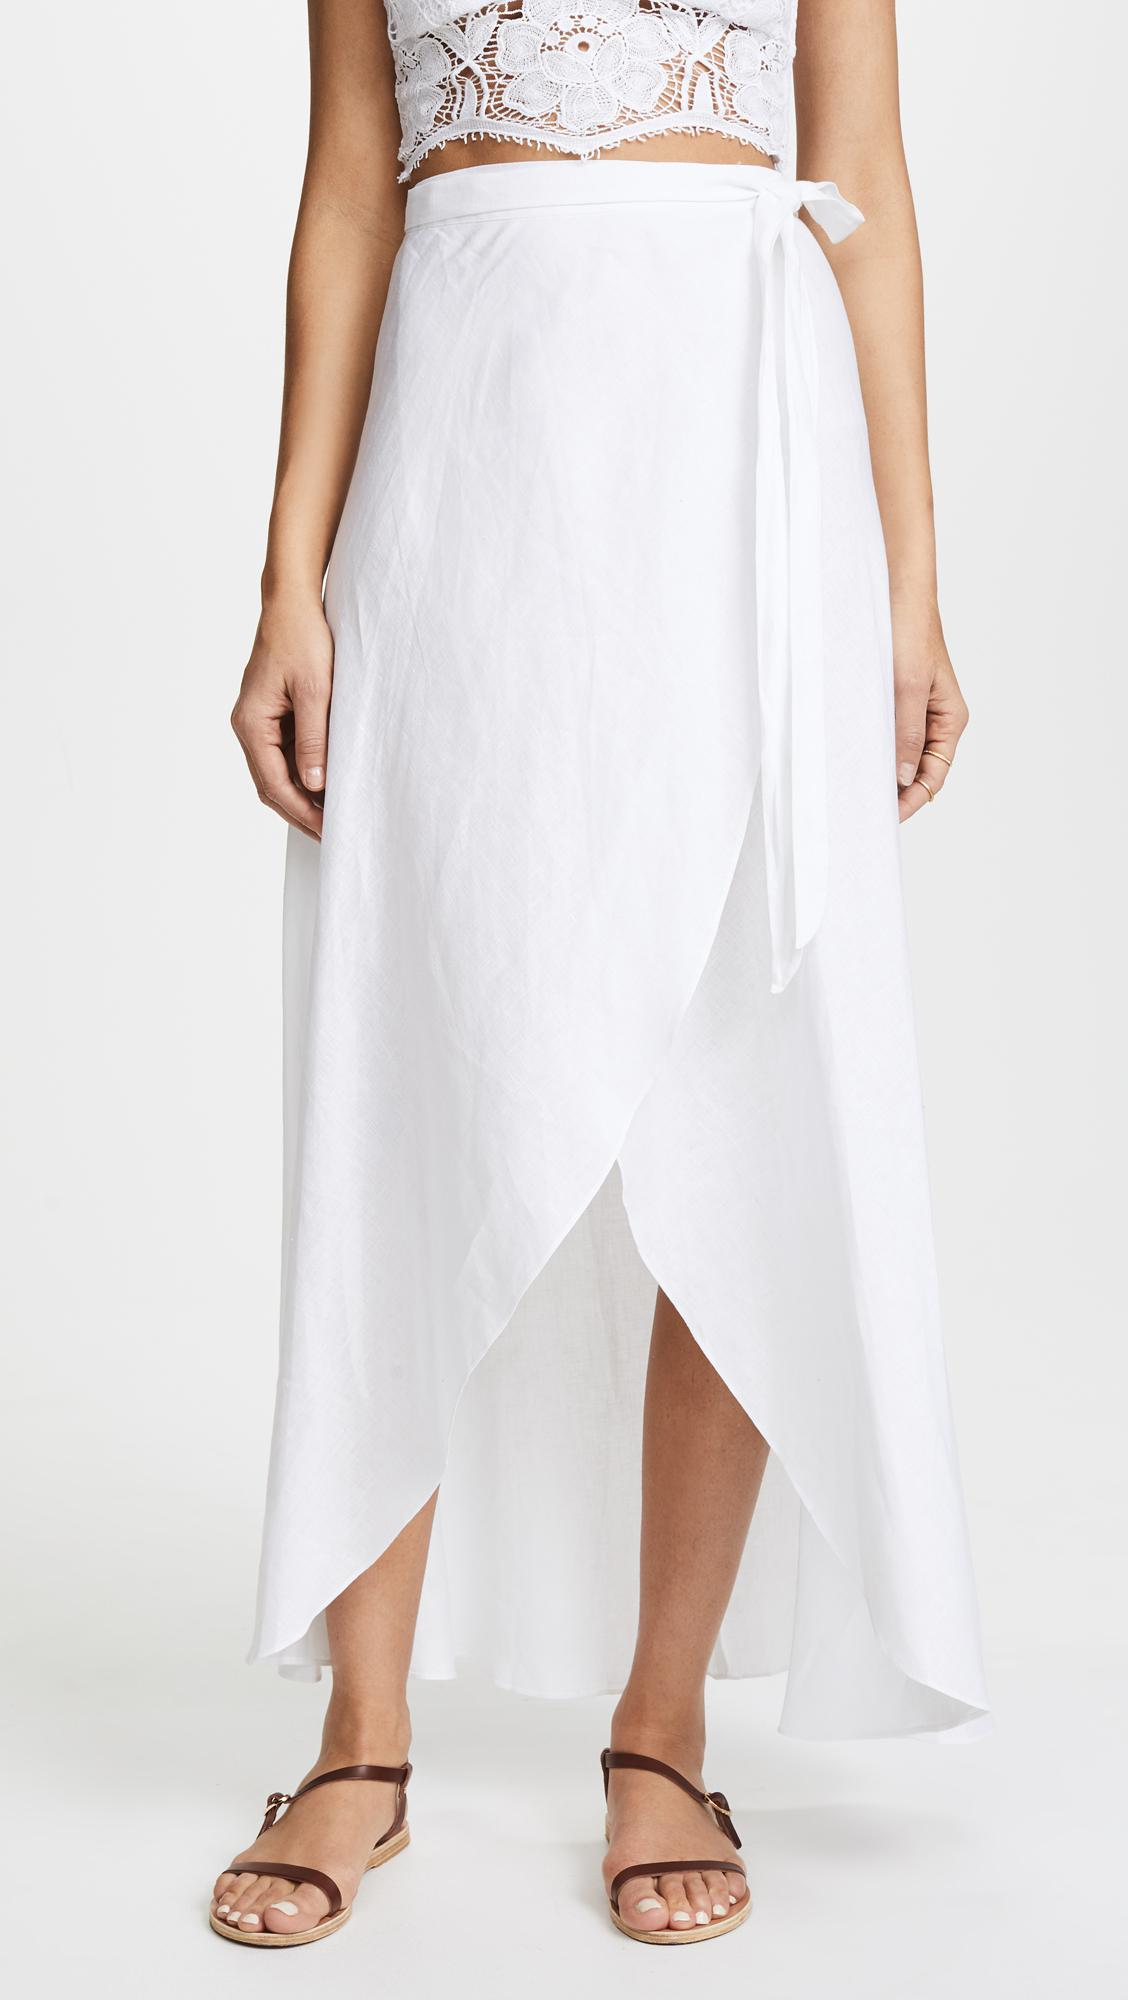 da24a6f3b2d Lyst - Miguelina Ballerina Skirt in White